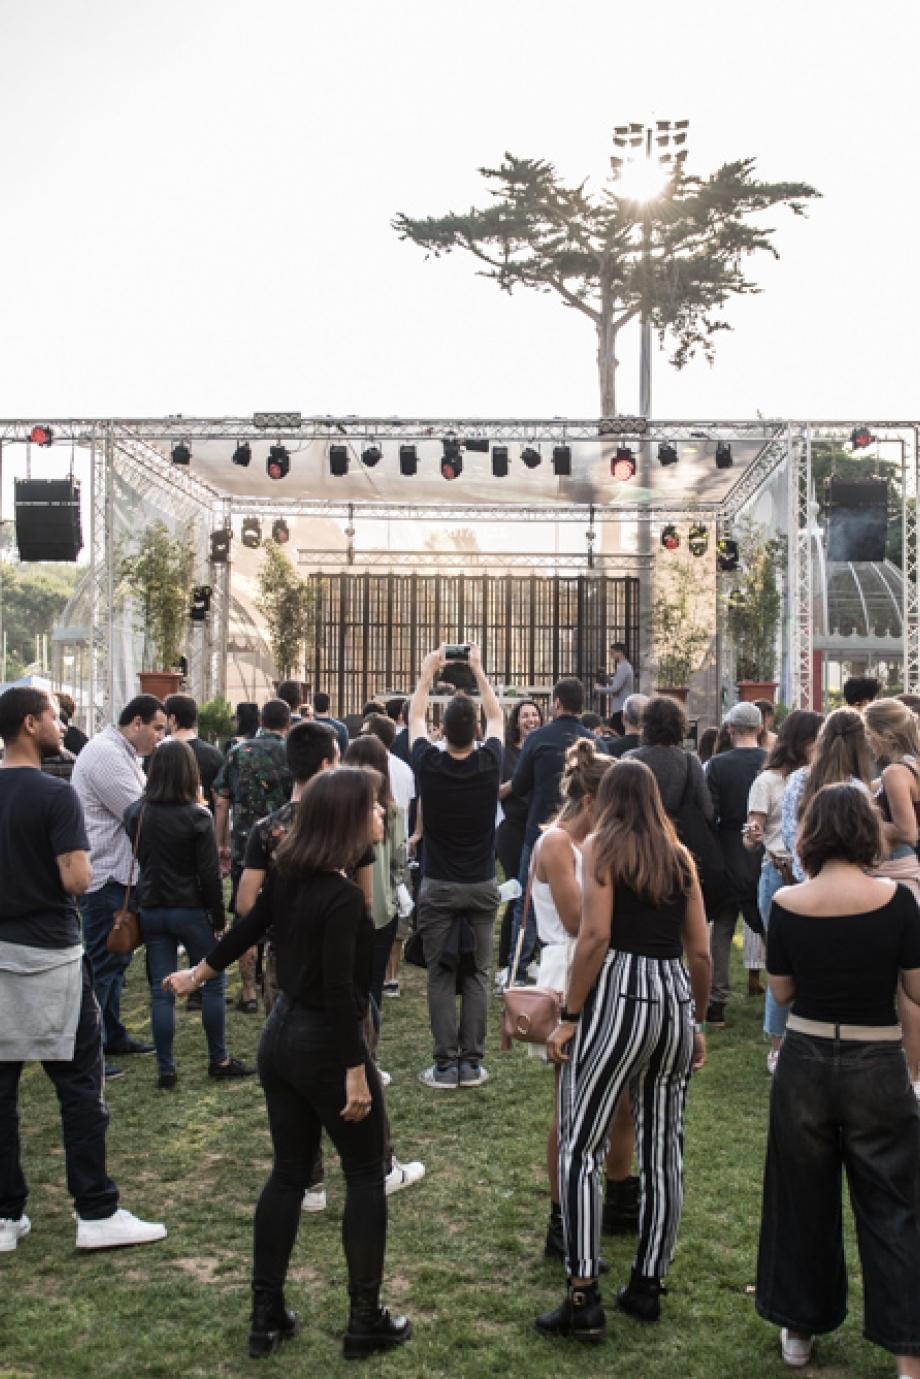 LisboaCool_Blog_Aqui Perto: OUT//FEST 2019